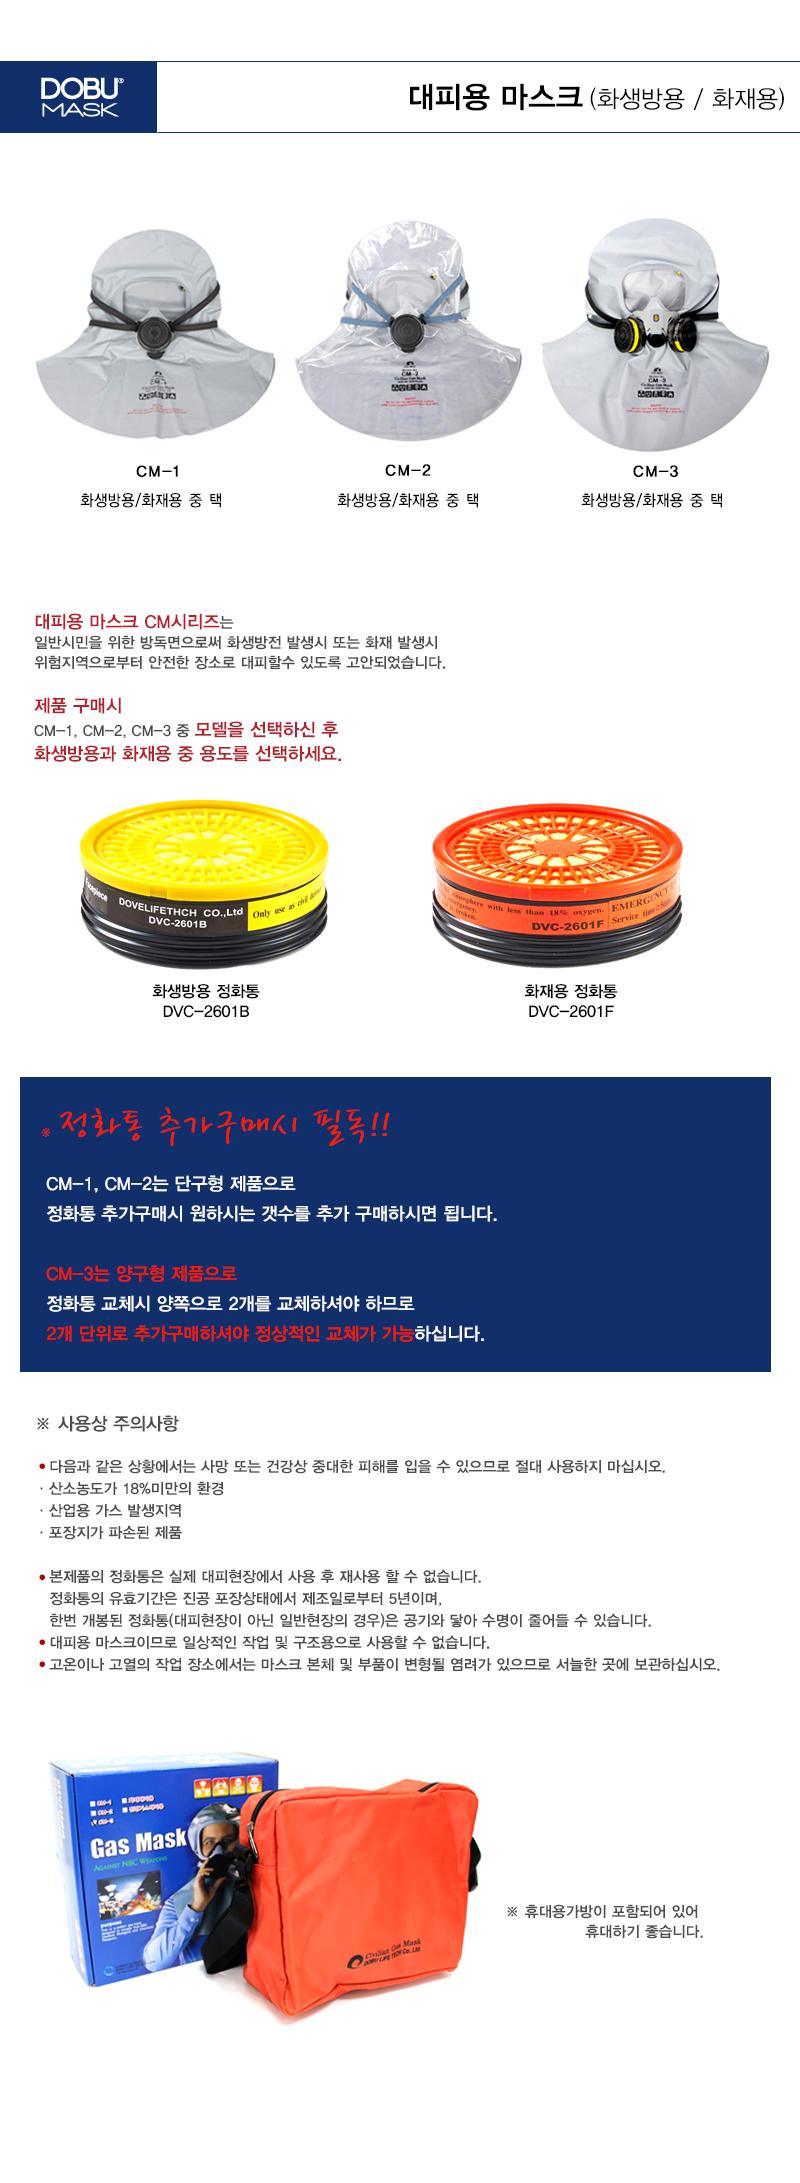 Escalade en Corée - Page 4 Cmseries-main